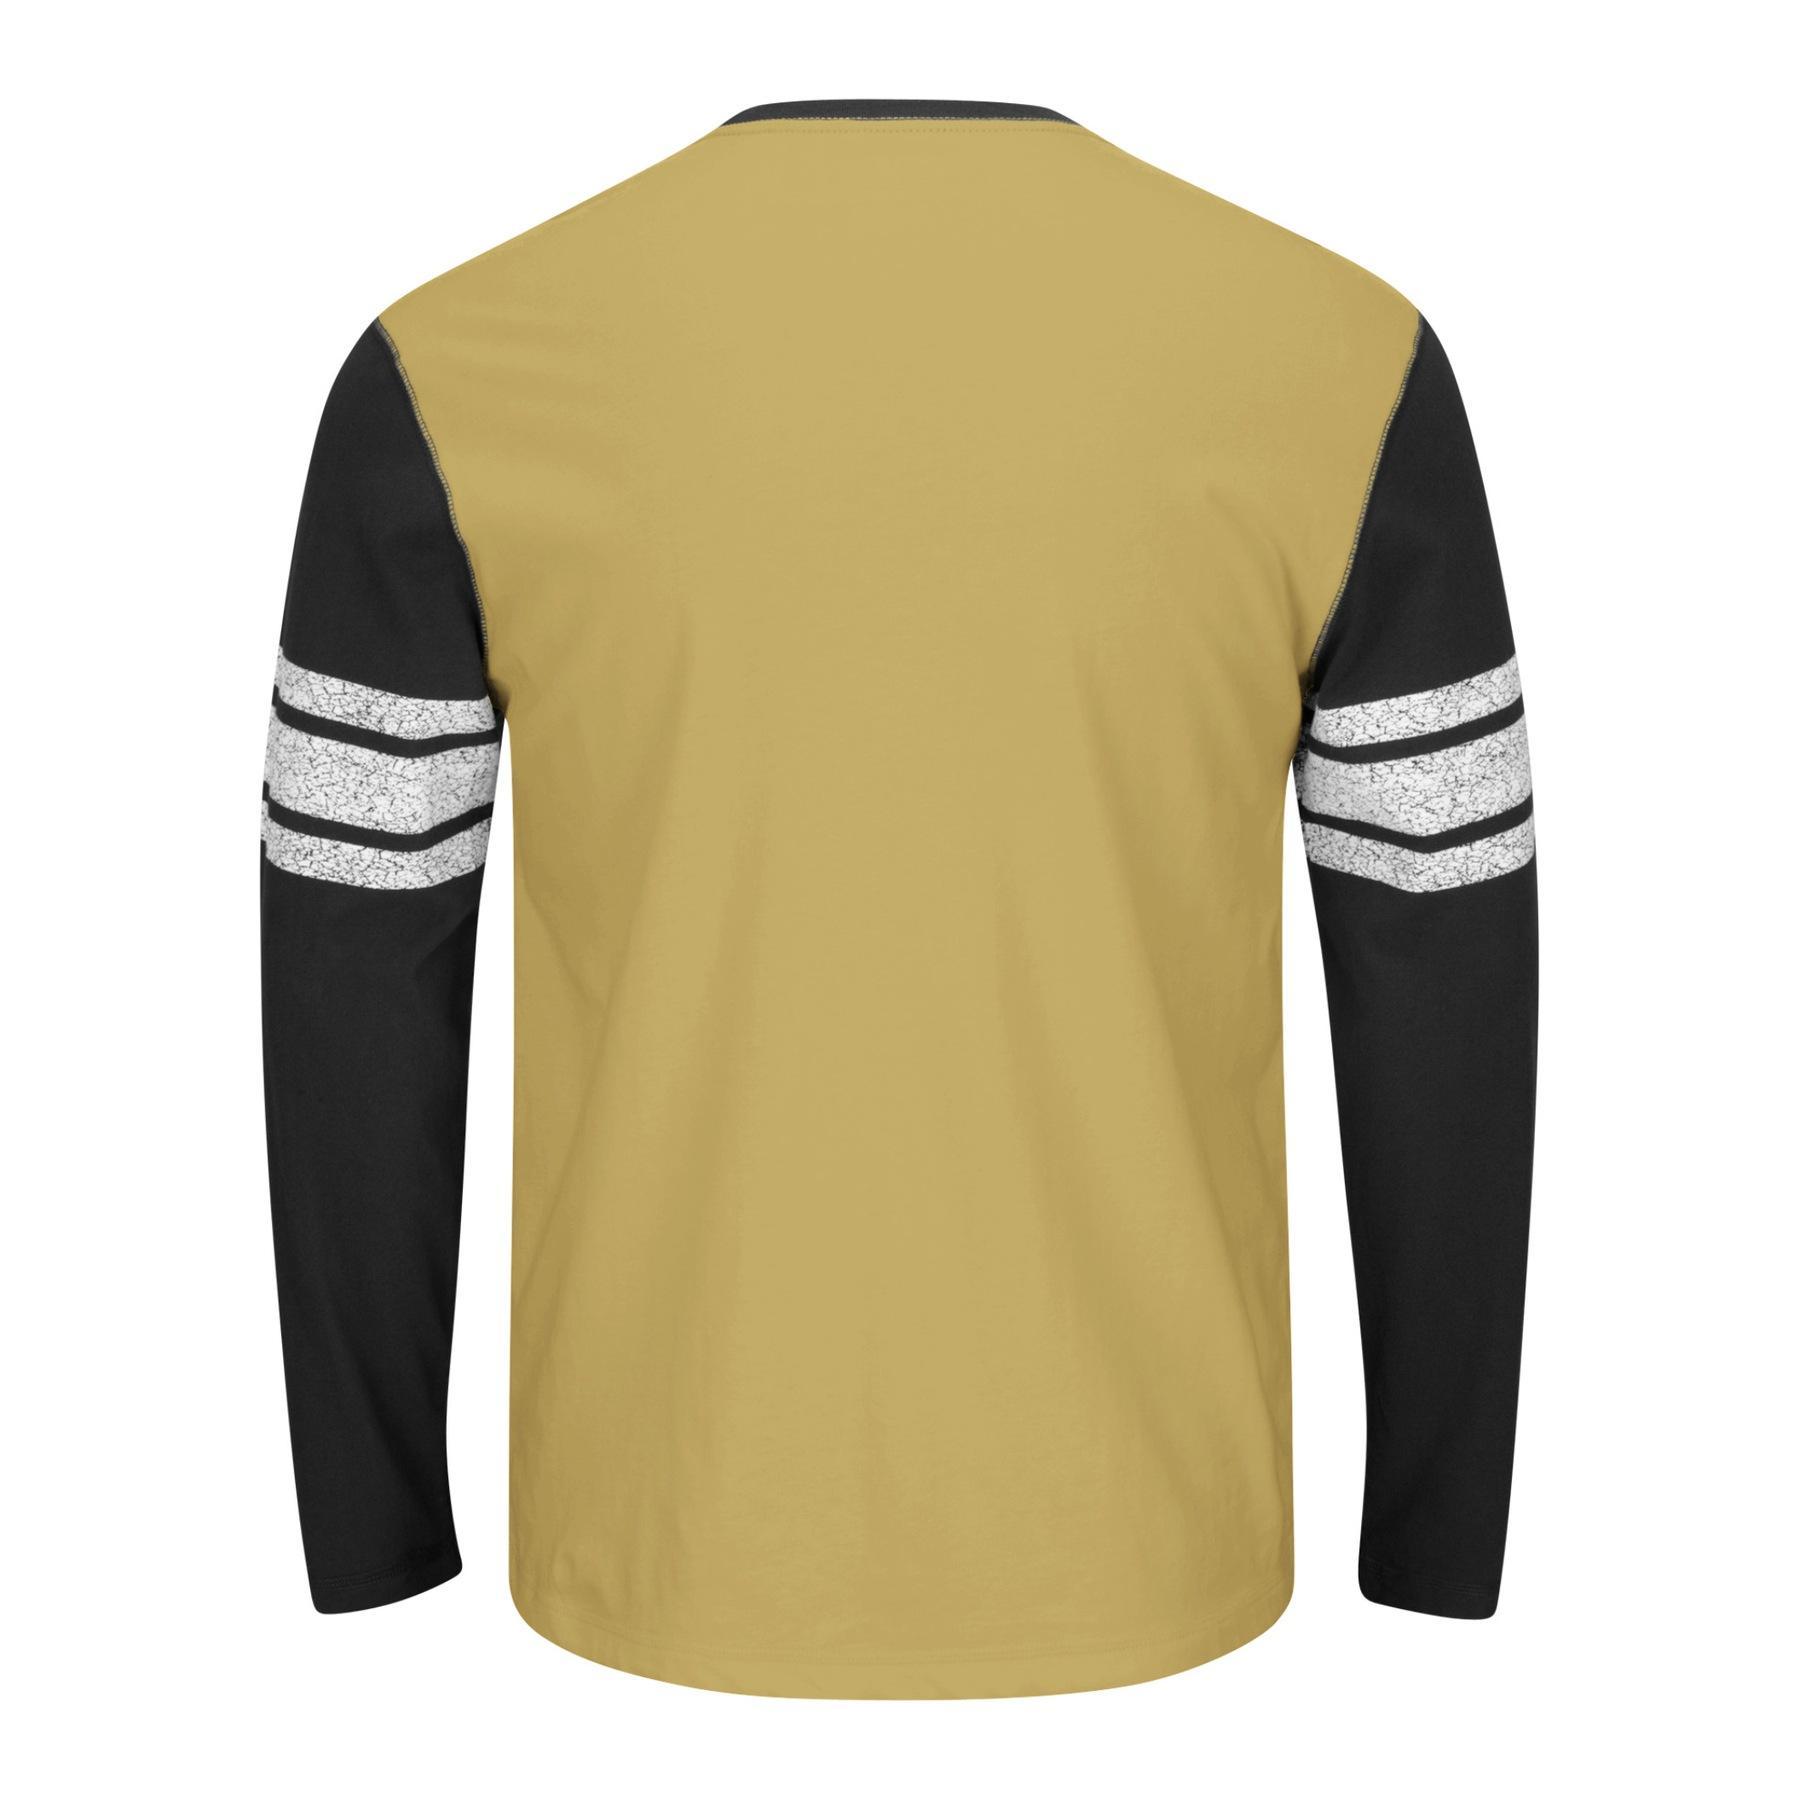 NFL Men's Raglan Shirt - New Orleans Saints